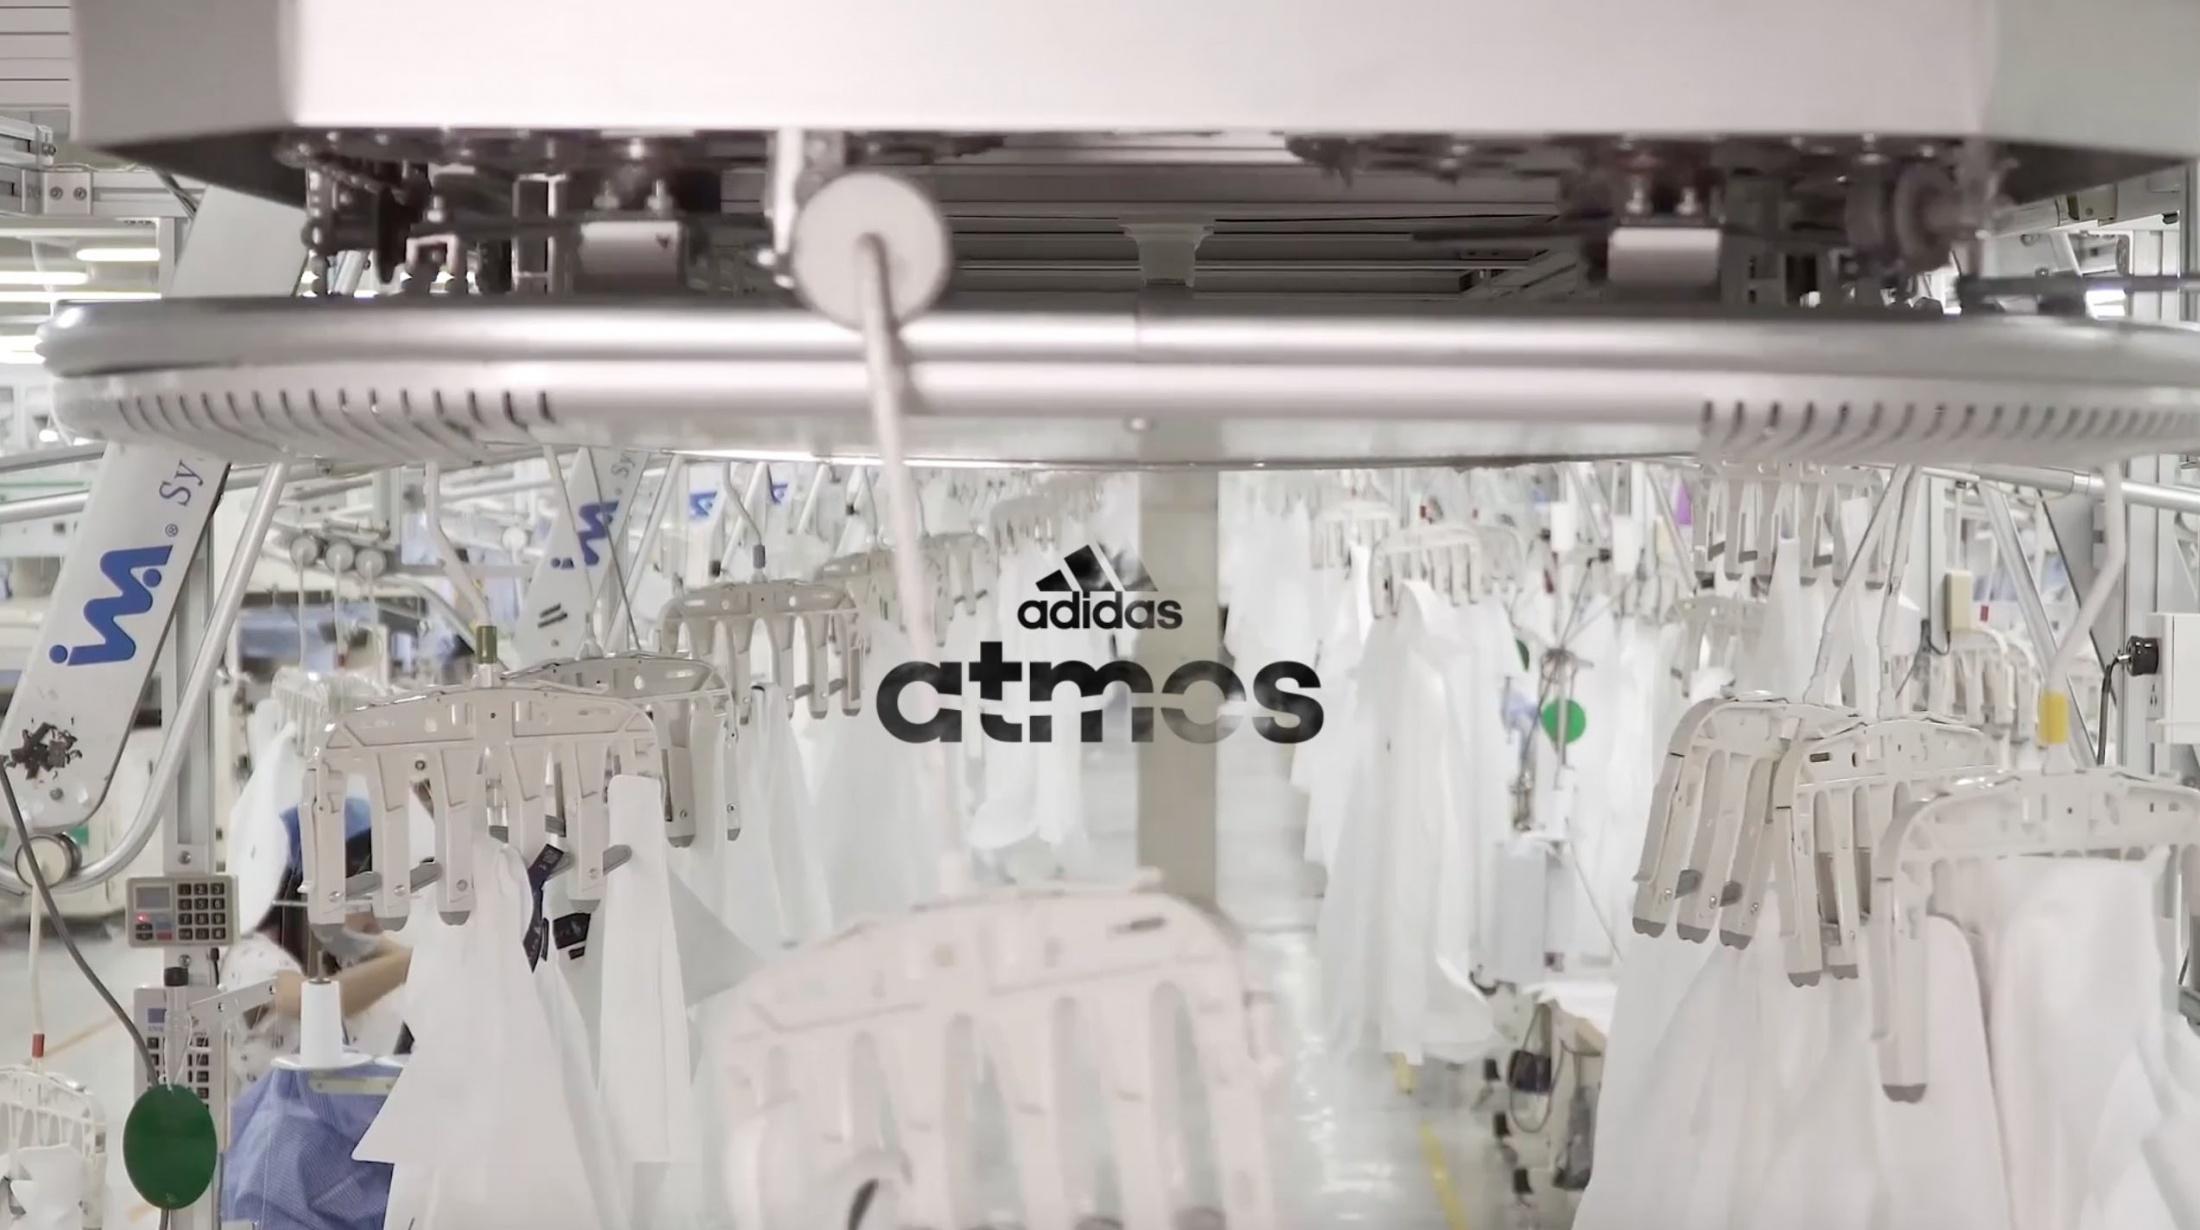 Thumbnail for Adidas Atmos